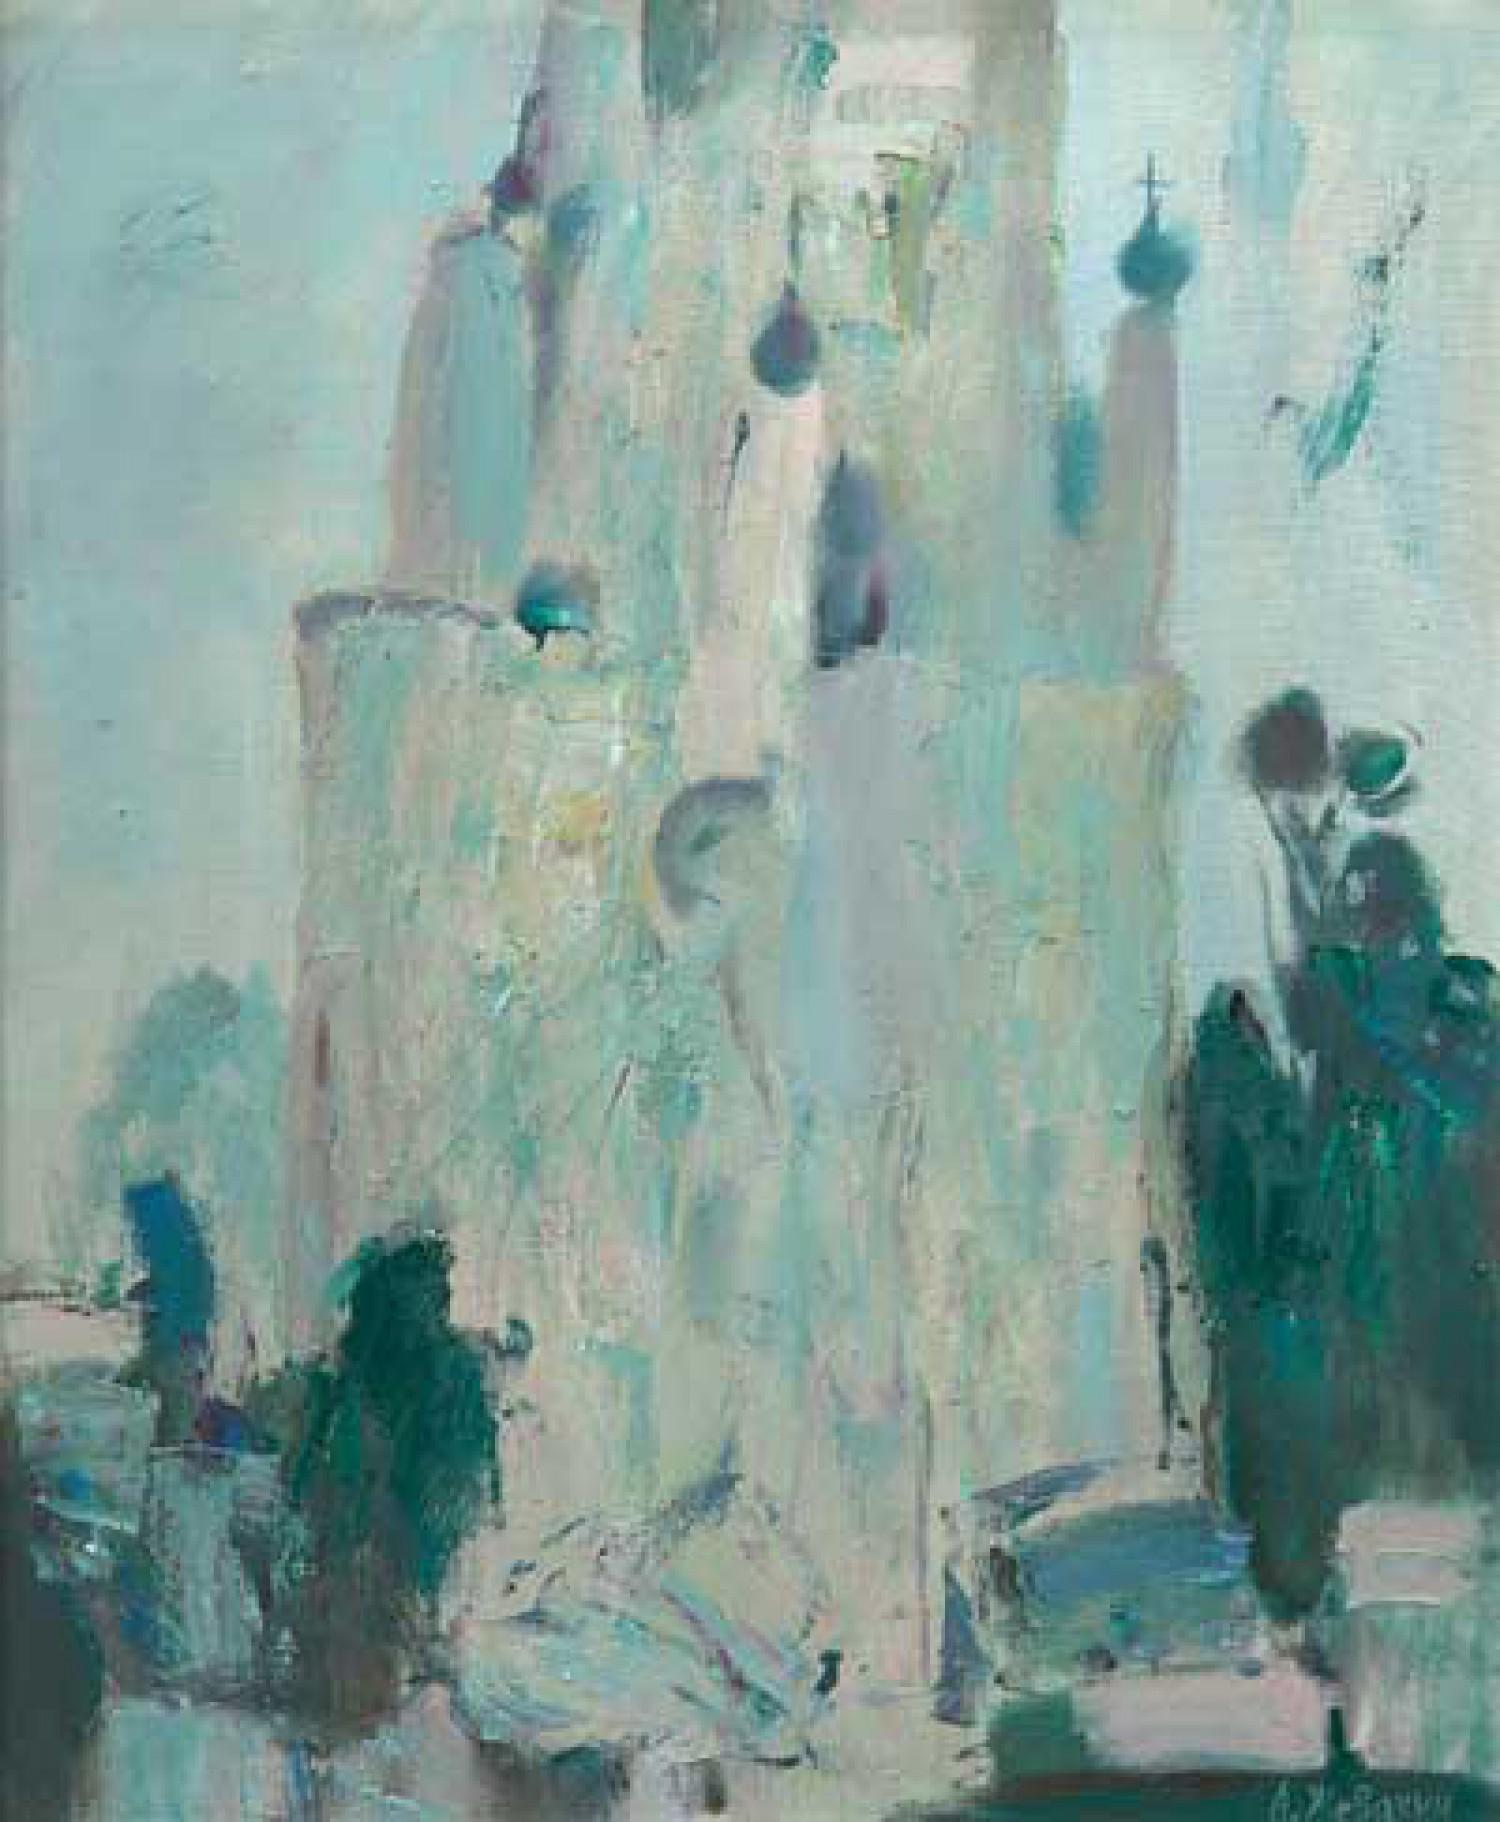 А.Н.Жевакин. Белая ночь. 2003. 100х80. Холст, масло. Цена 70 000 руб.